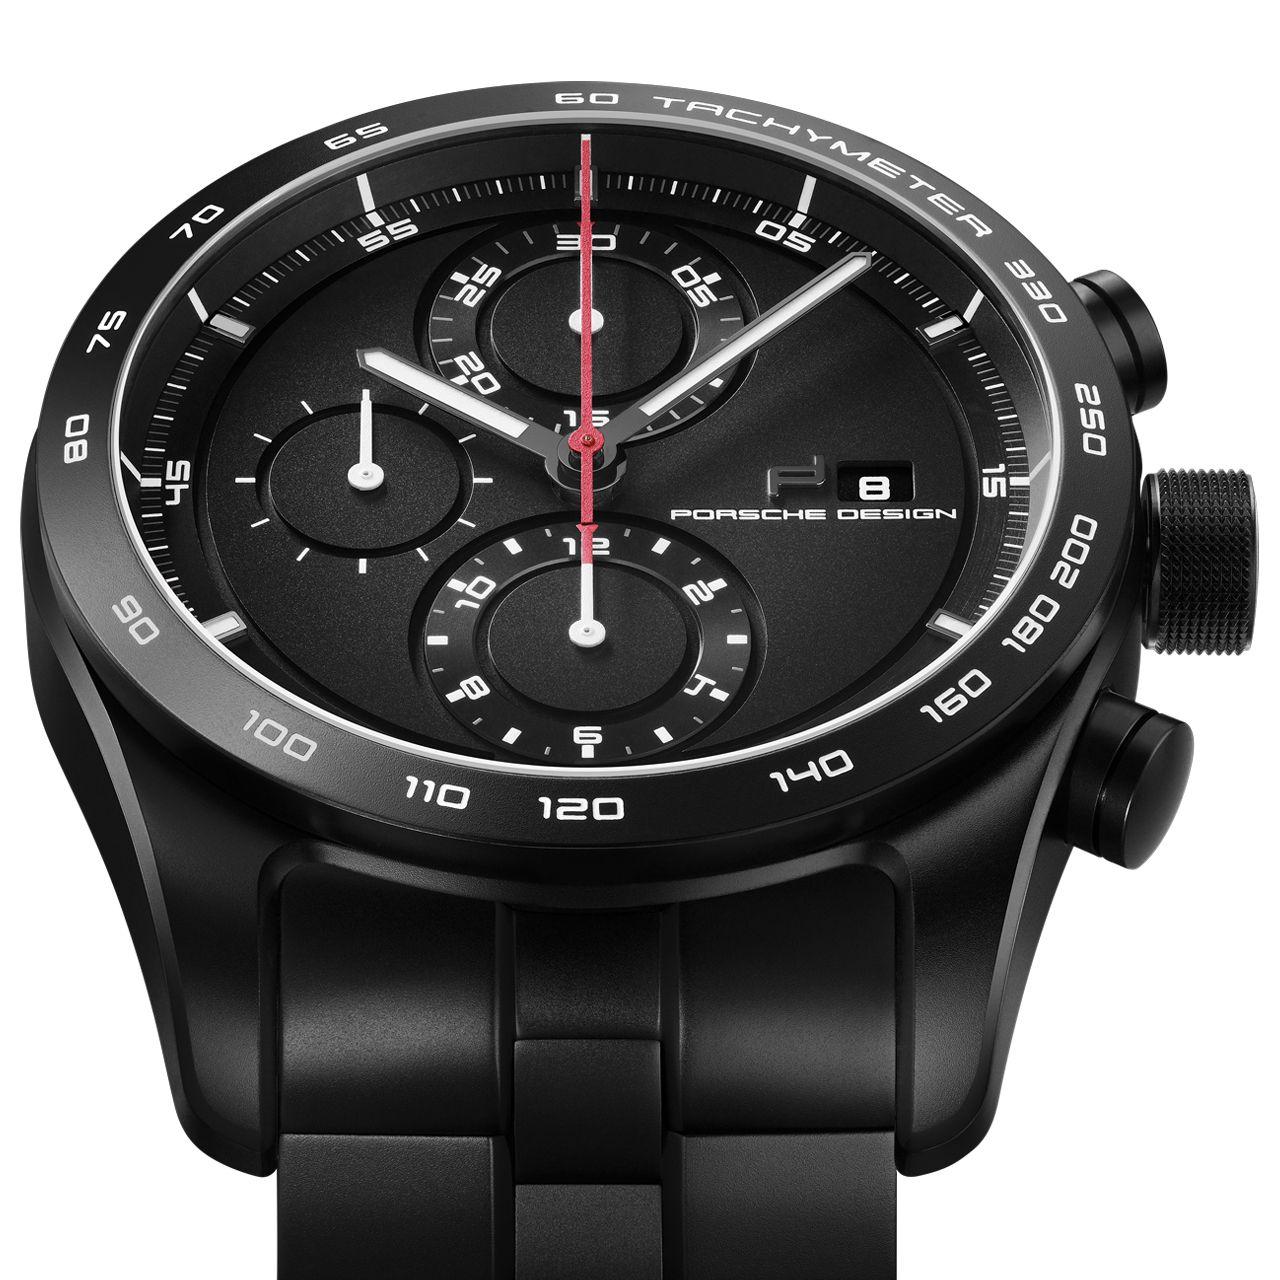 Montre Porsche Design Chronotimer Series 1 Matte Black vue 3